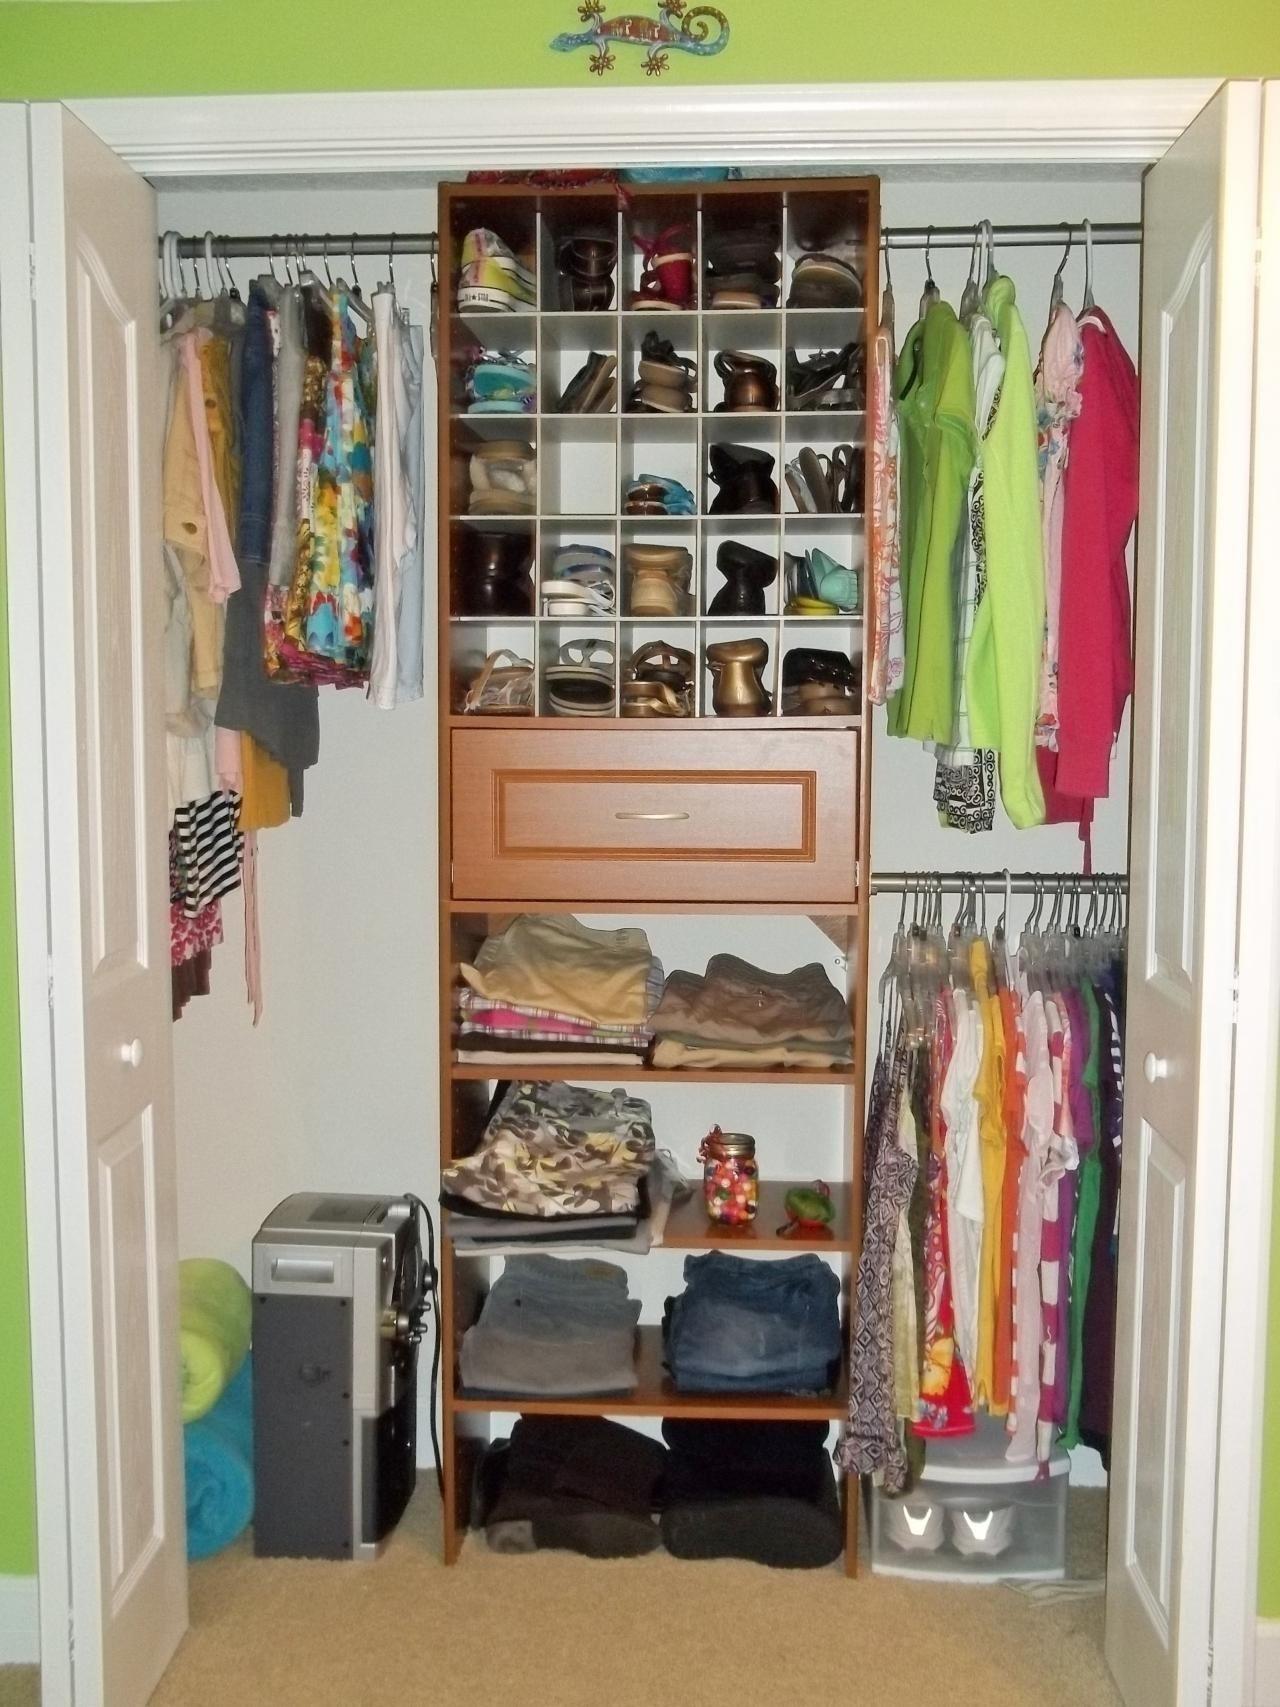 10 Attractive Closet Organization Ideas For Small Closets bedroom small walk in closet ideas ikea bedroom closet design small 2021